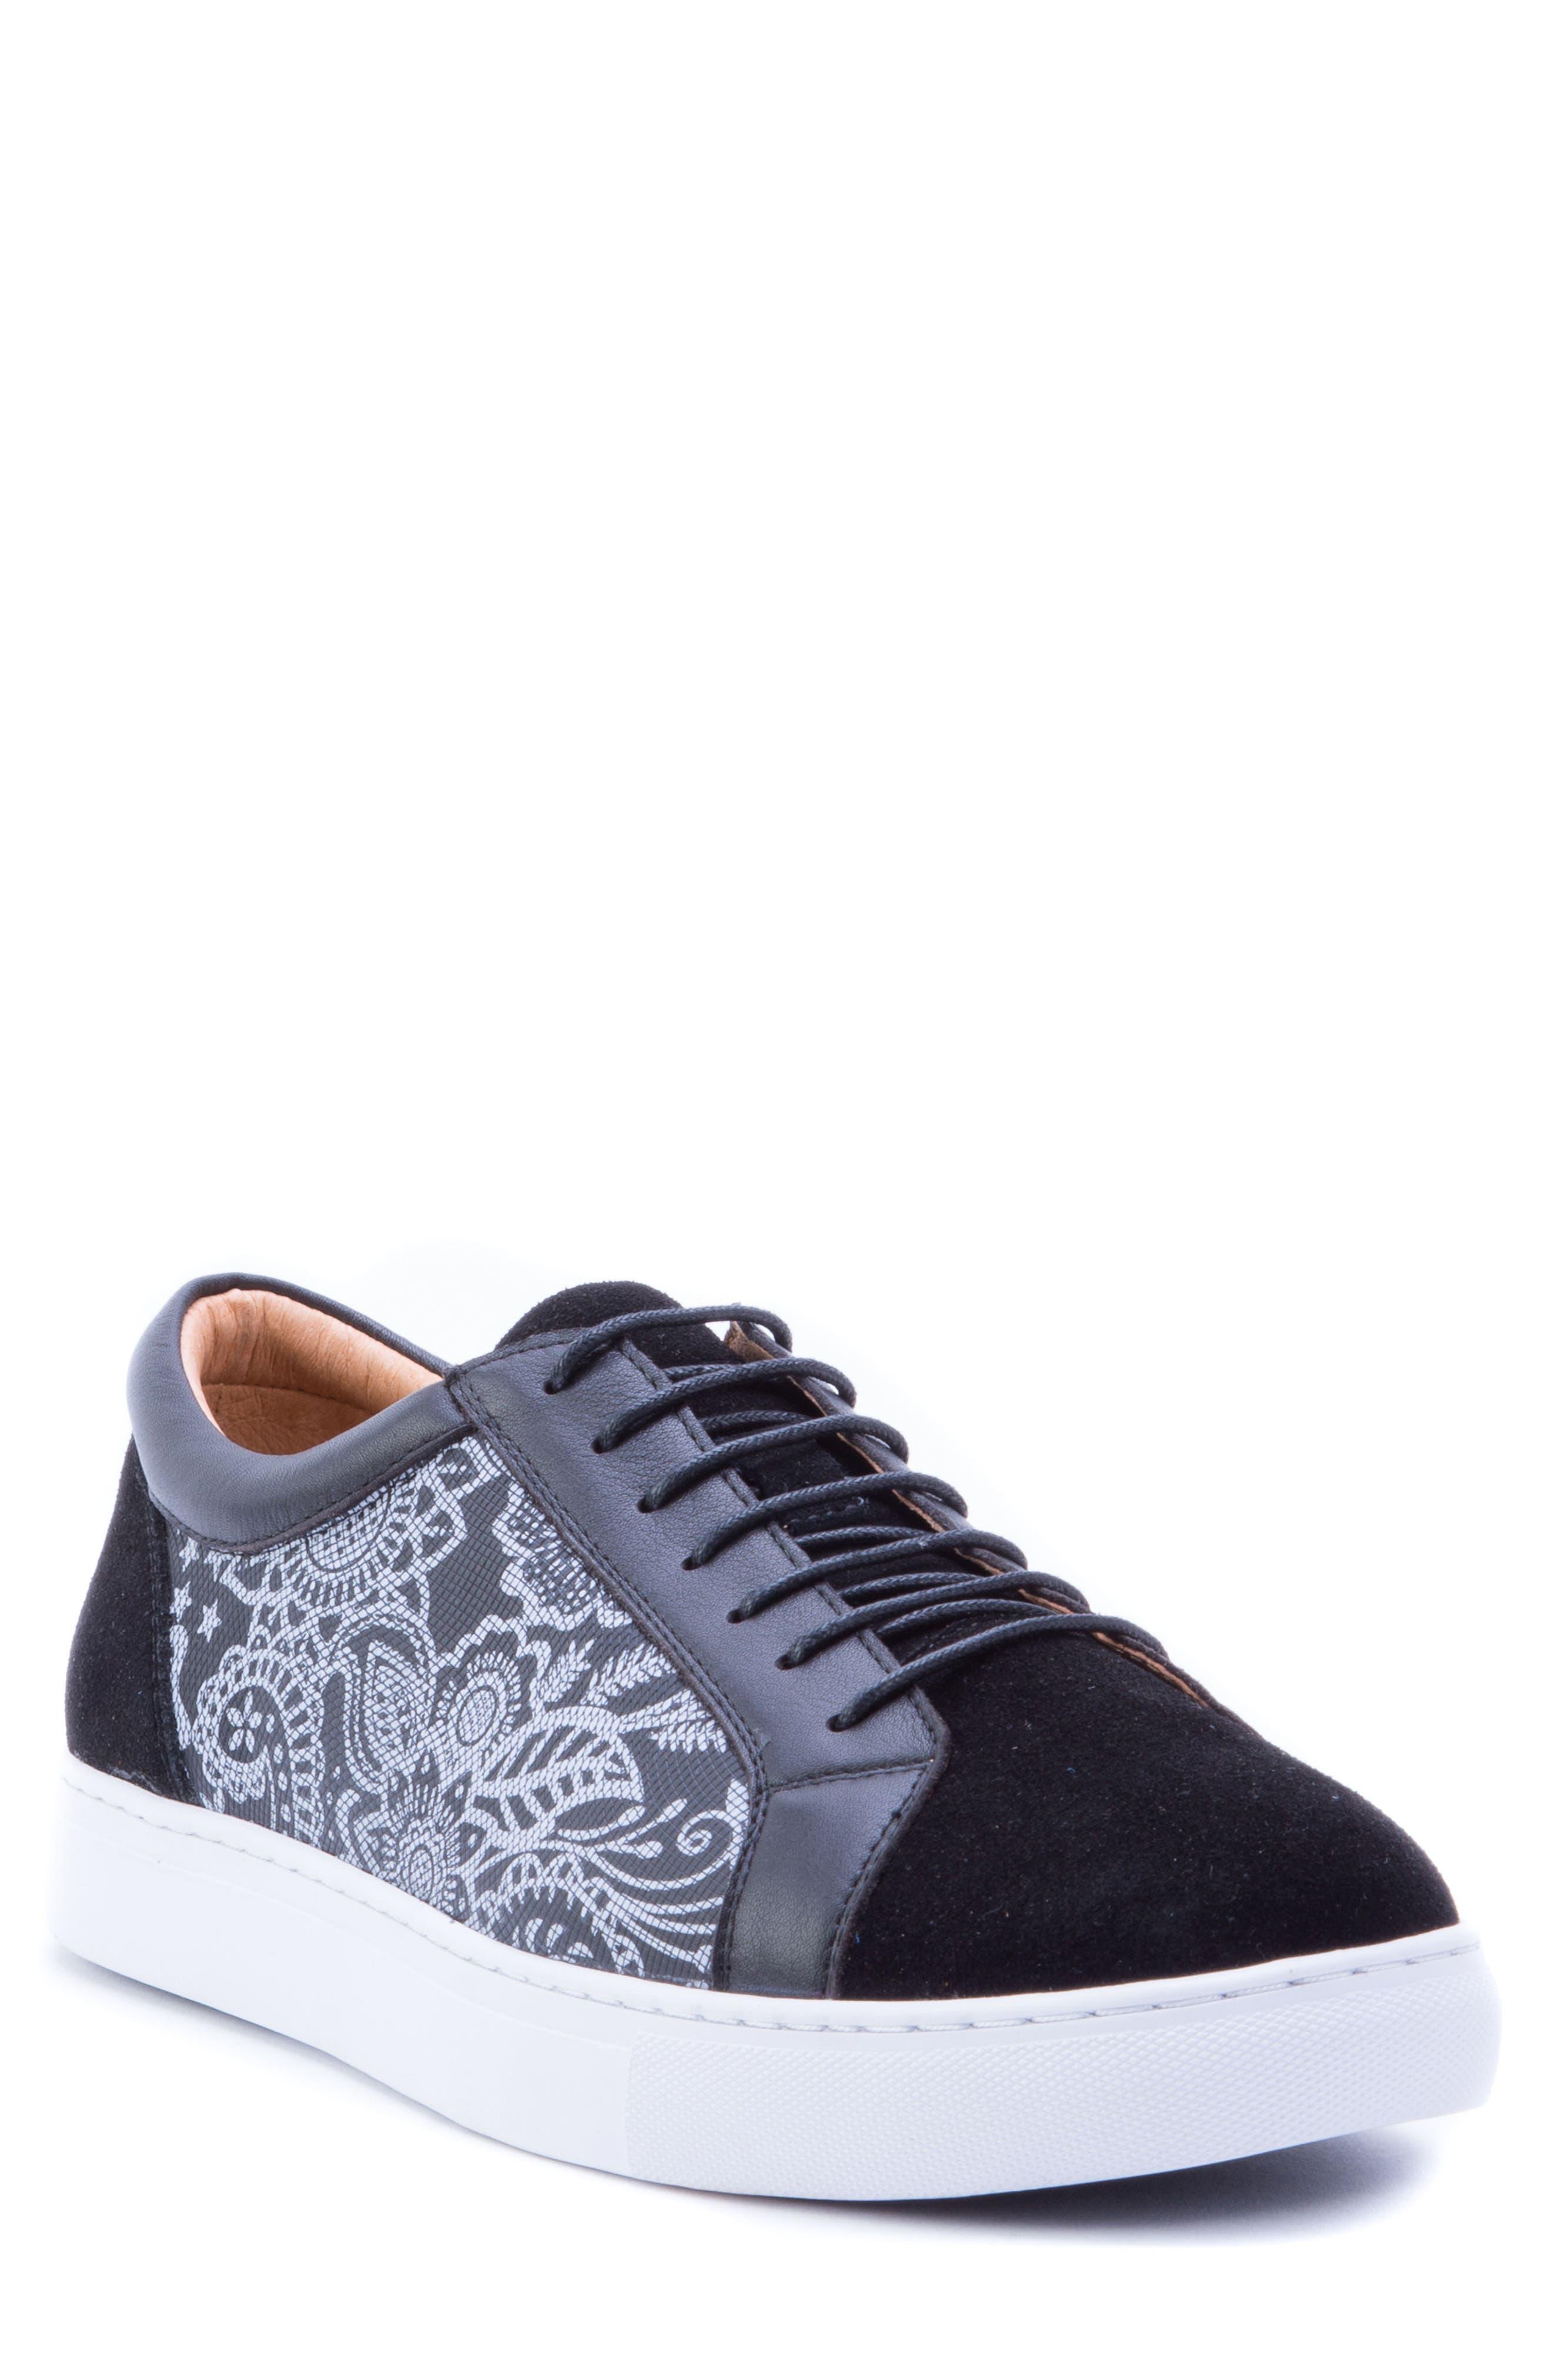 Rubio Floral Sneaker,                             Main thumbnail 1, color,                             BLACK SUEDE